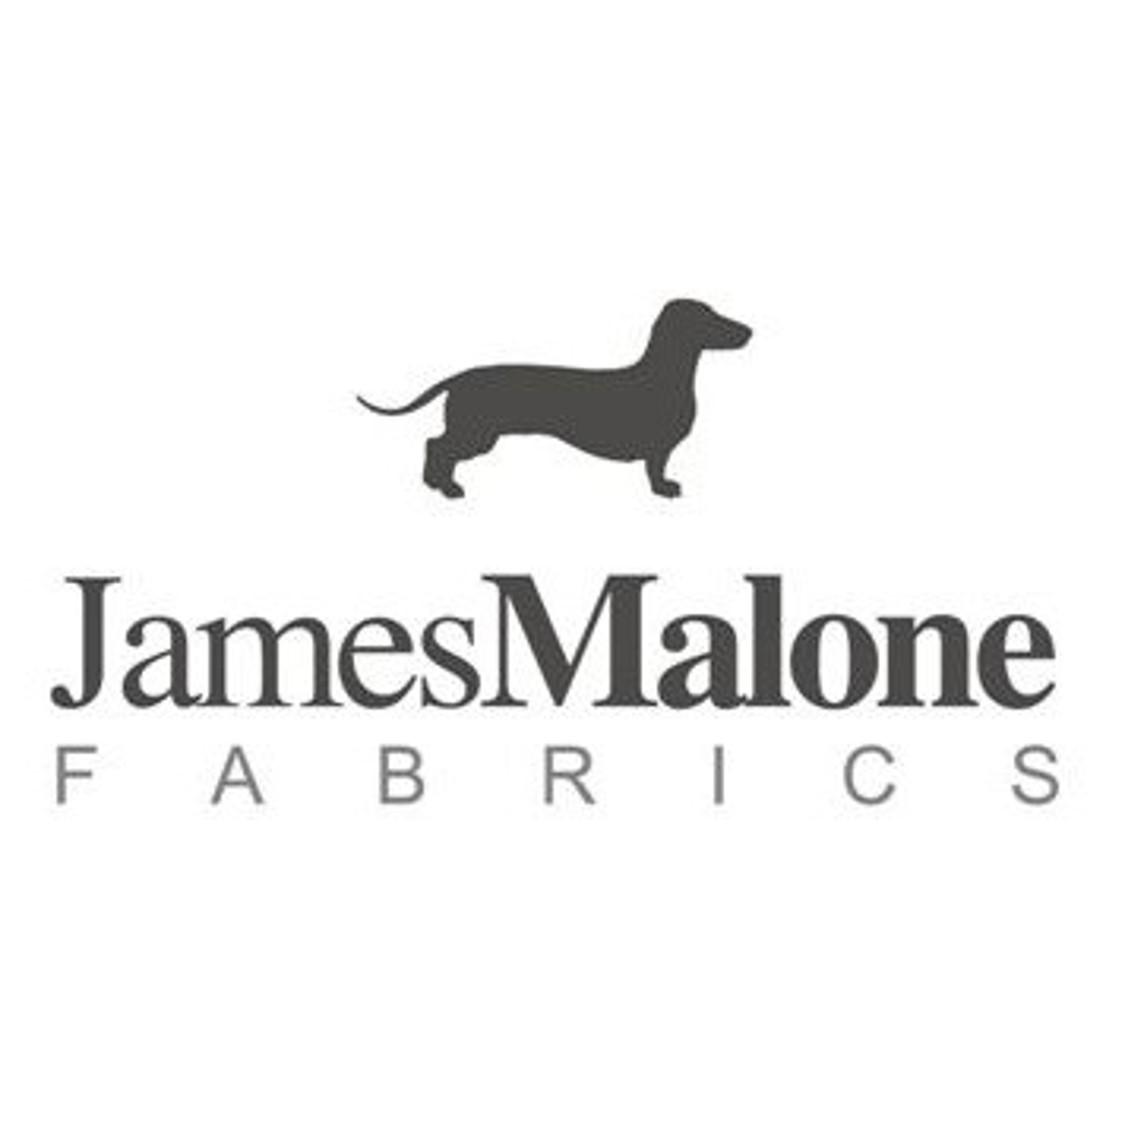 https://anafexmainteriorismo.com/wp-content/uploads/2018/06/james-malone.jpg